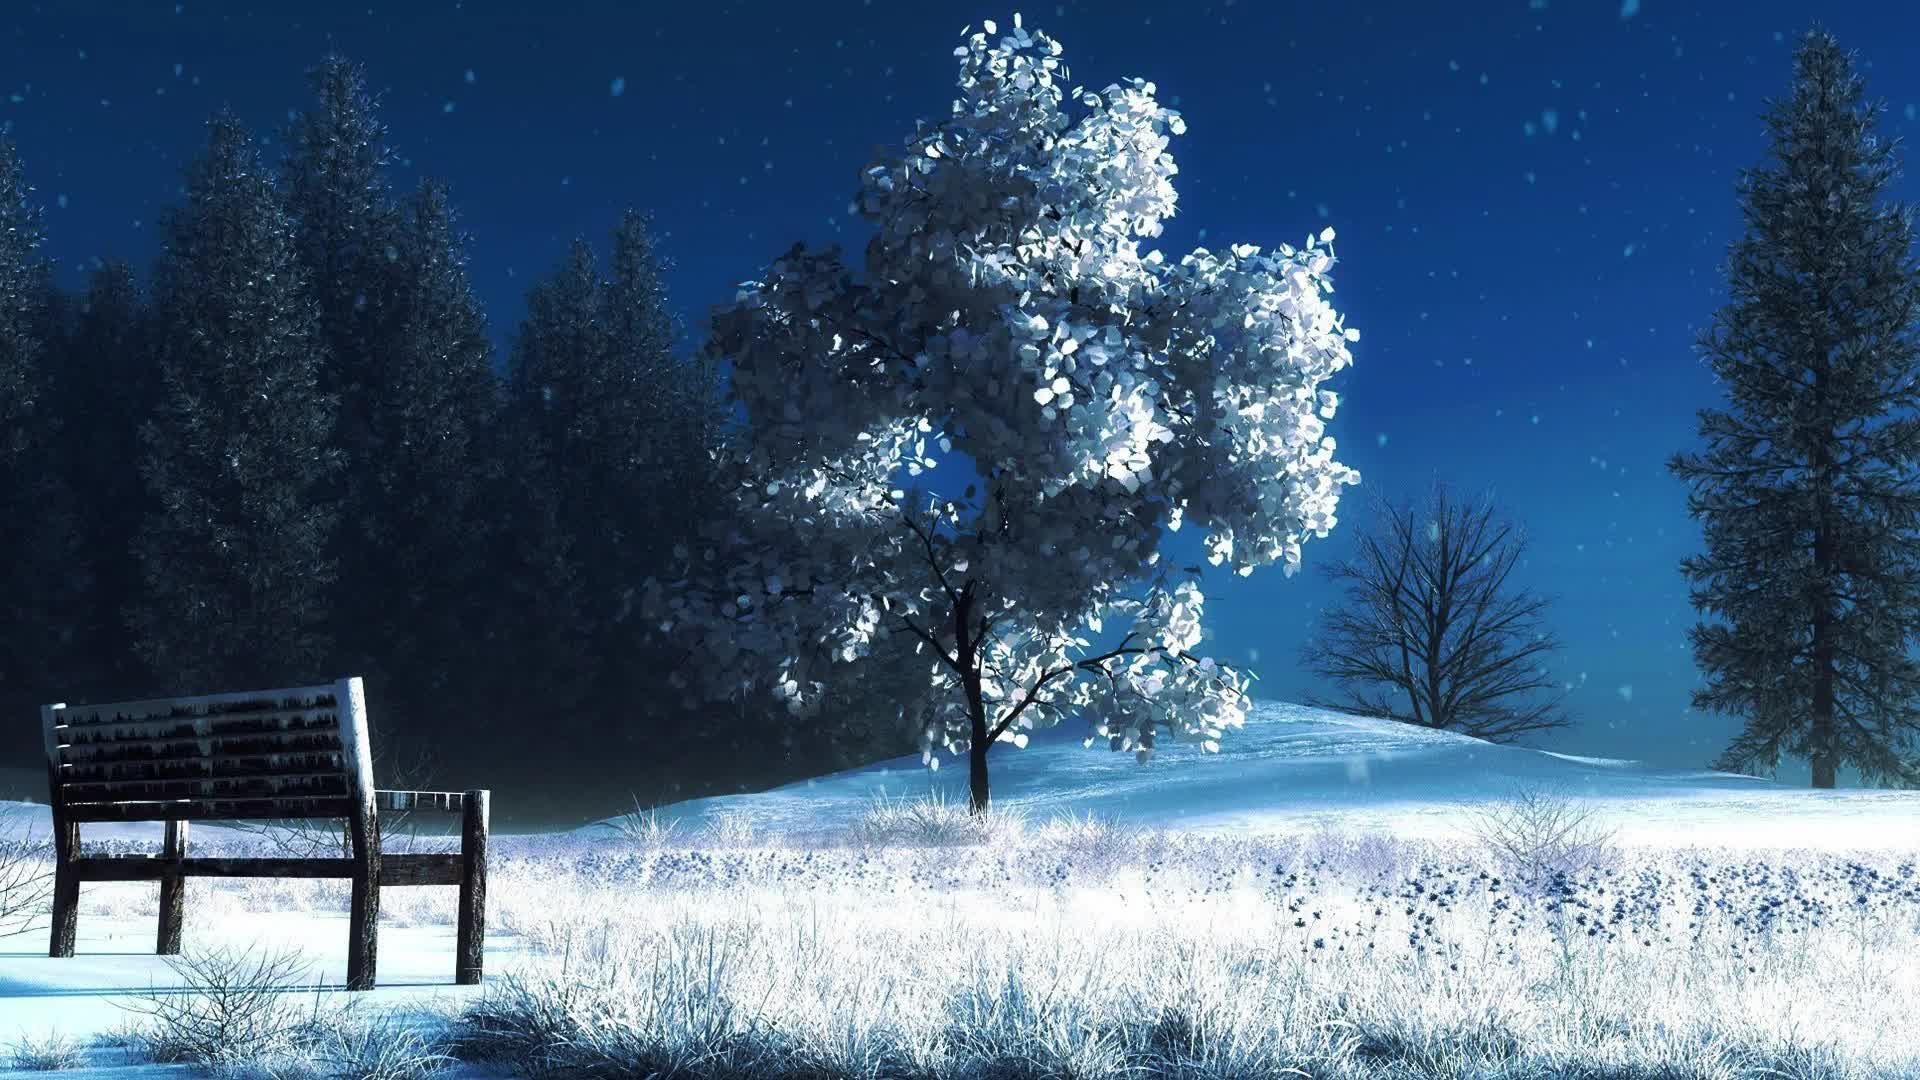 Зимний парк - живые обои